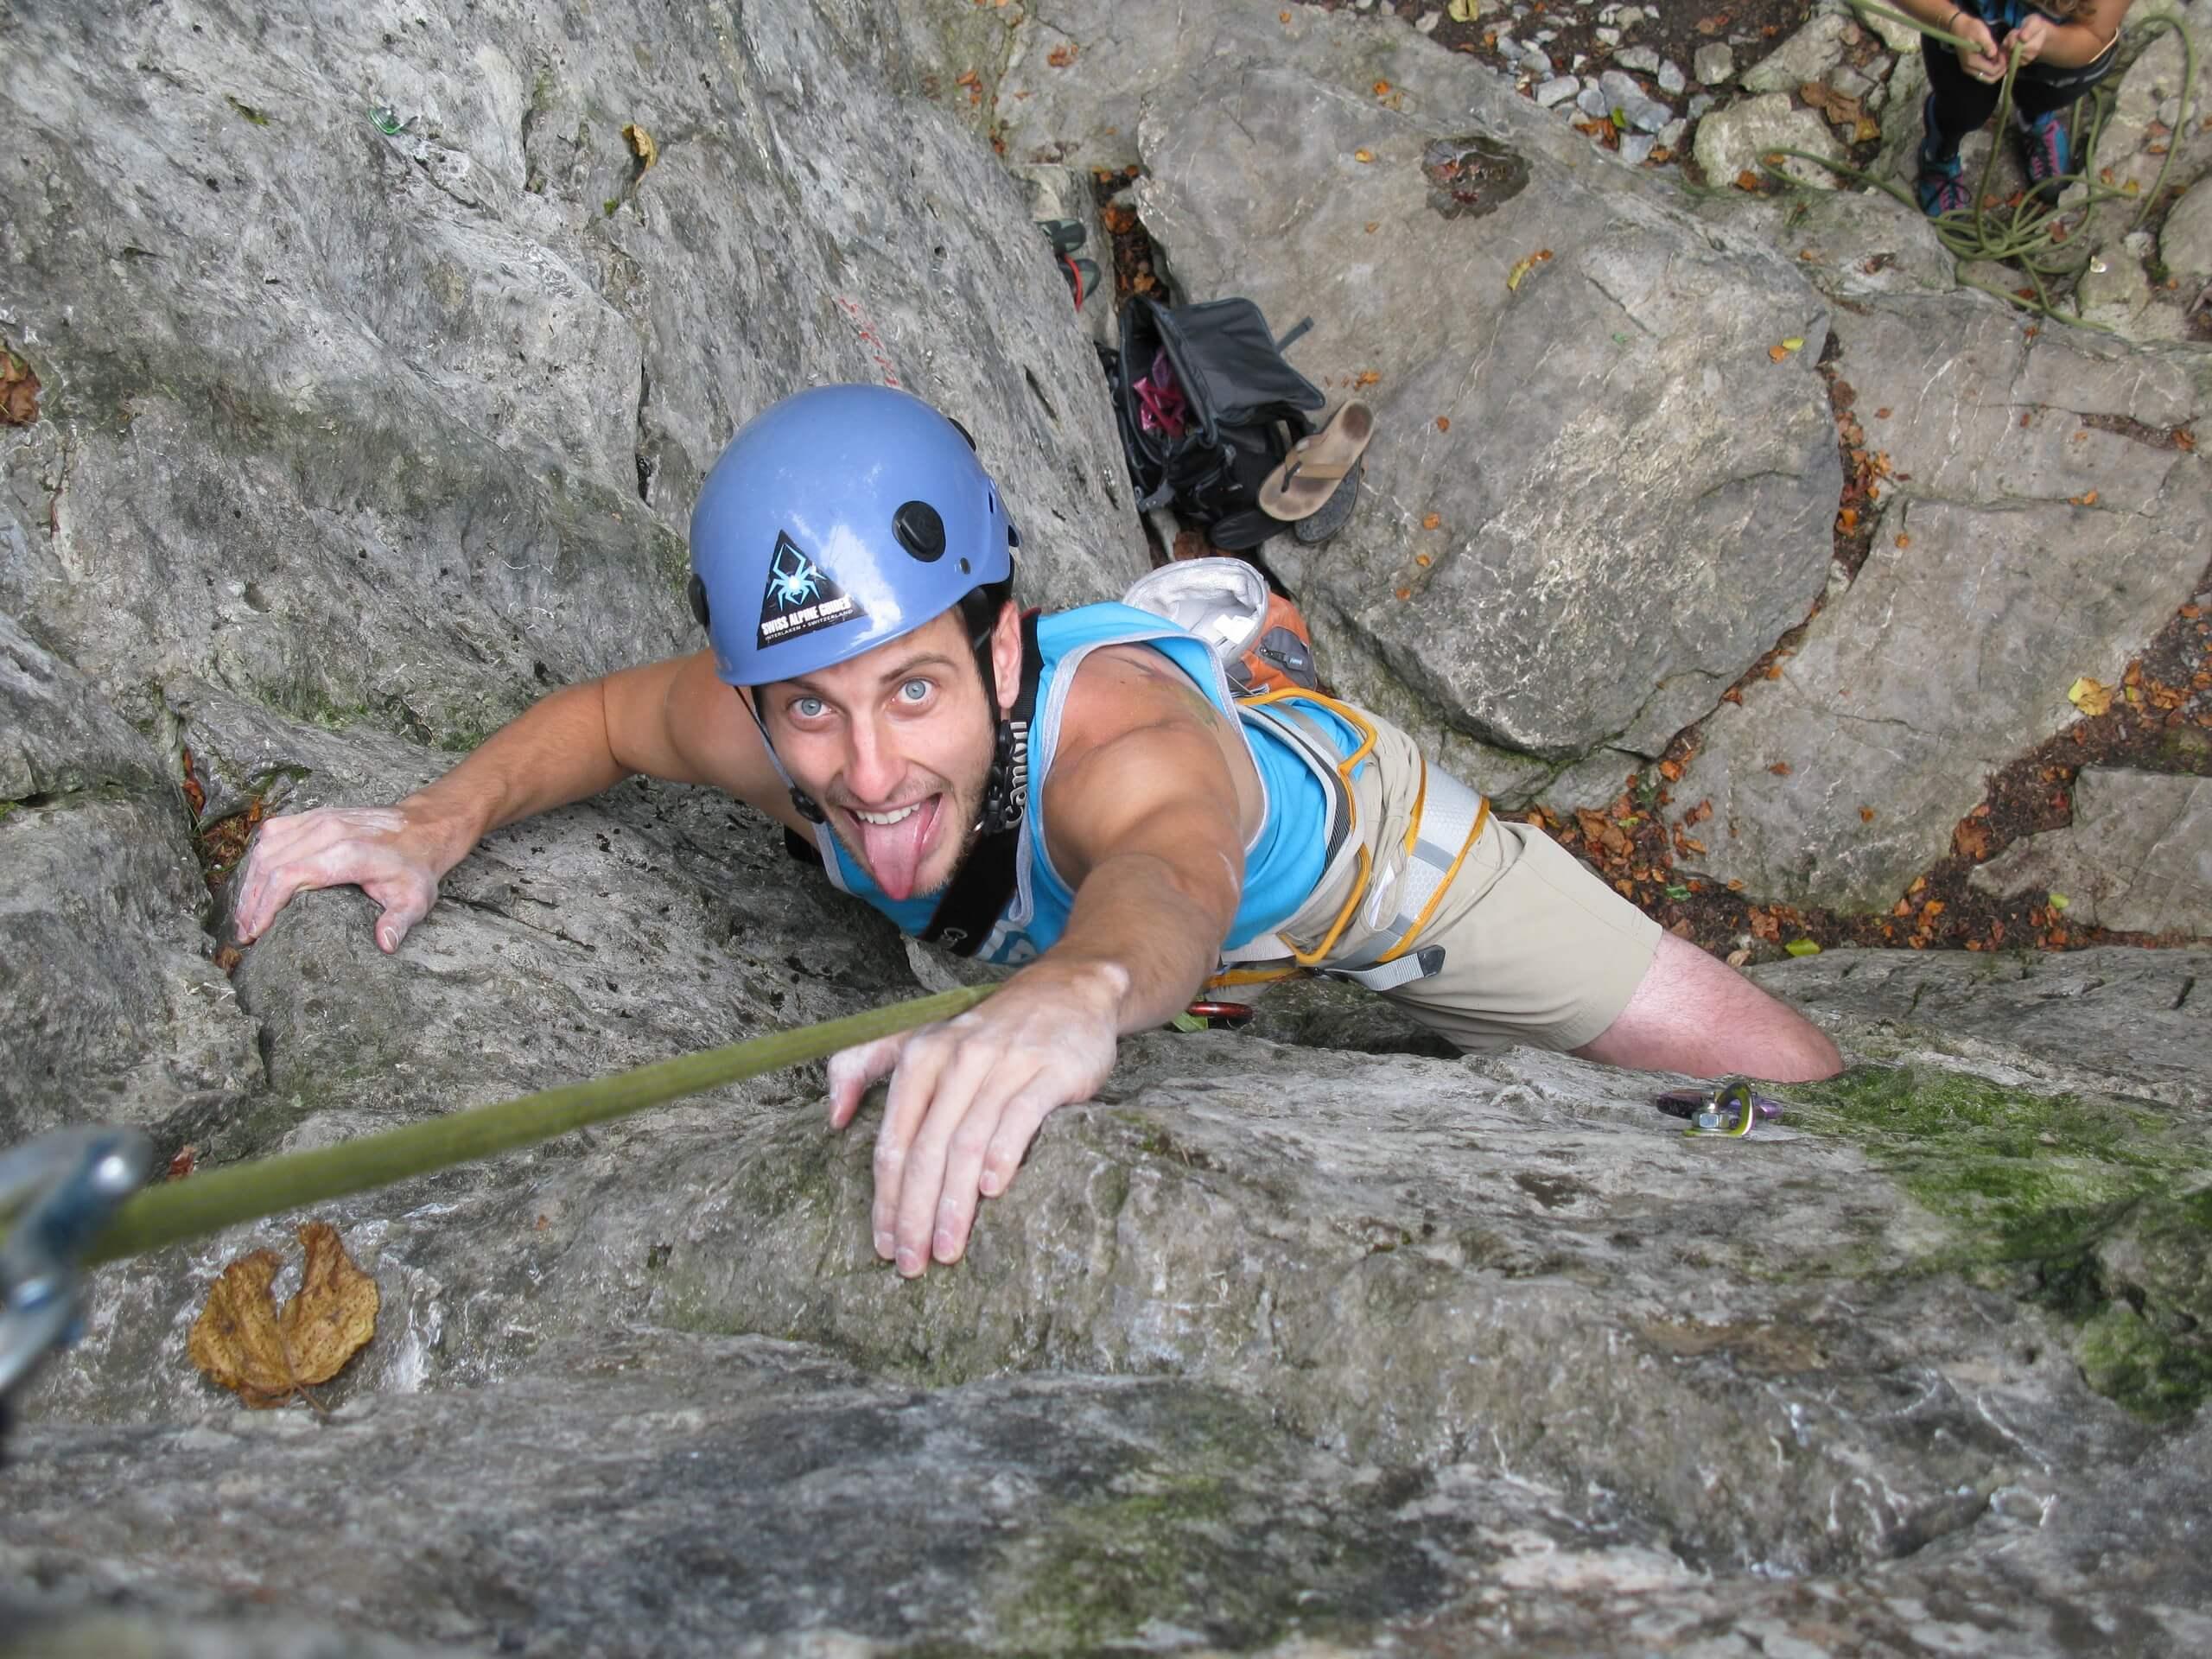 swiss-alpine-guides-klettern-felswand-rock-climbing